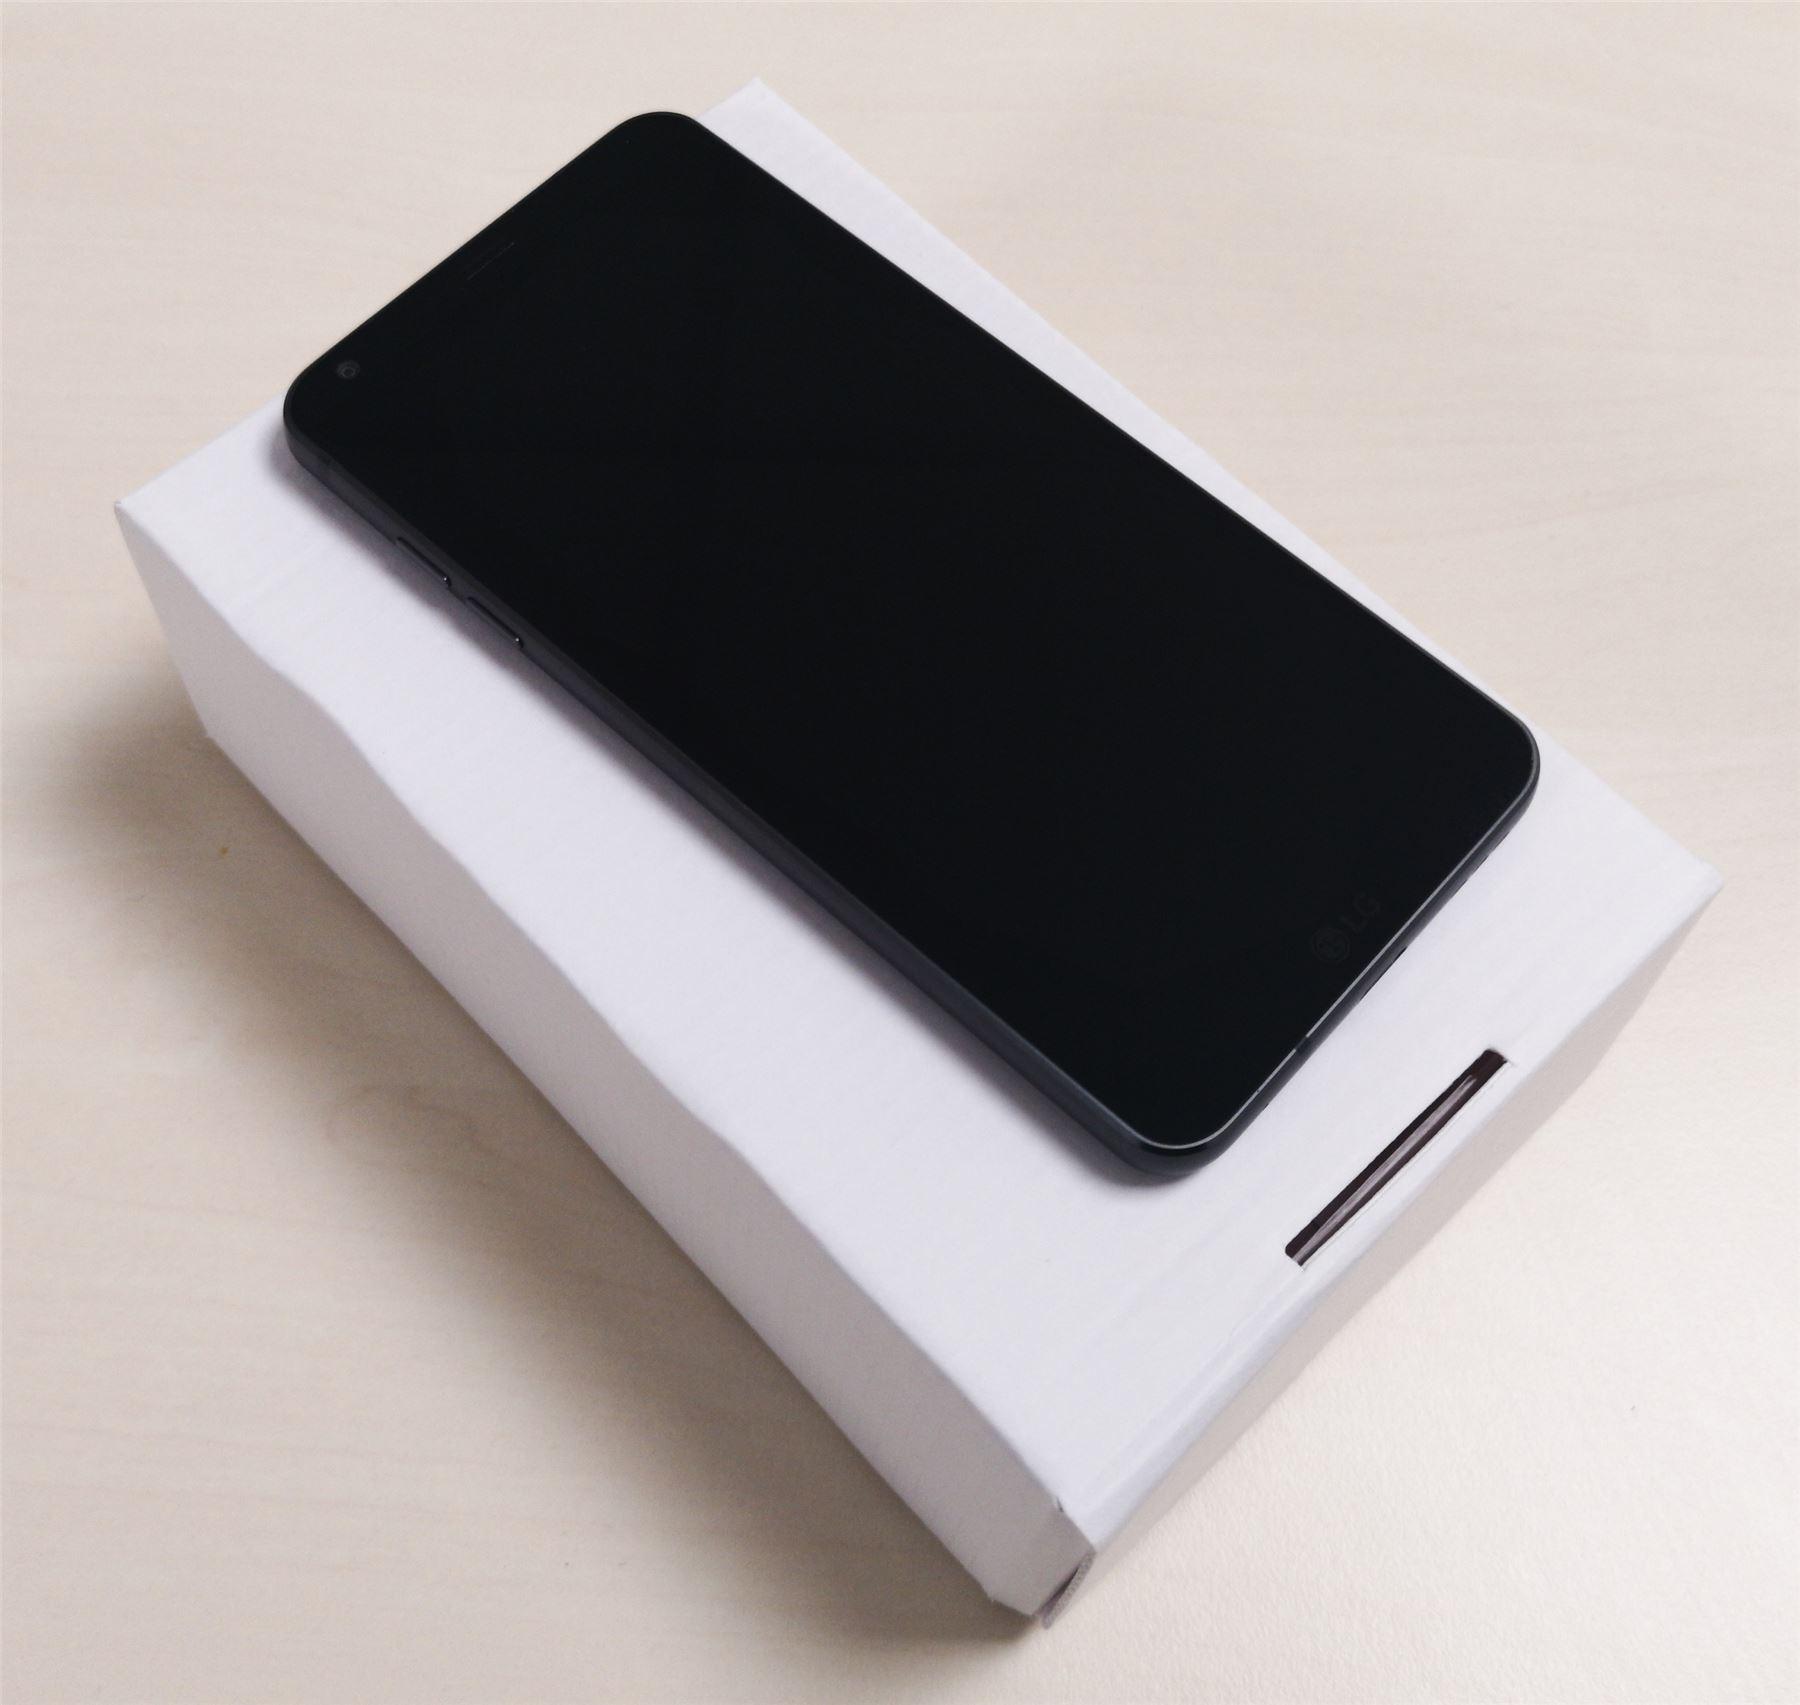 Details about LG G6 H870 PRISTINE CONDITION - 32GB - 4GB RAM - 13MP - BLACK  - UNLOCKED